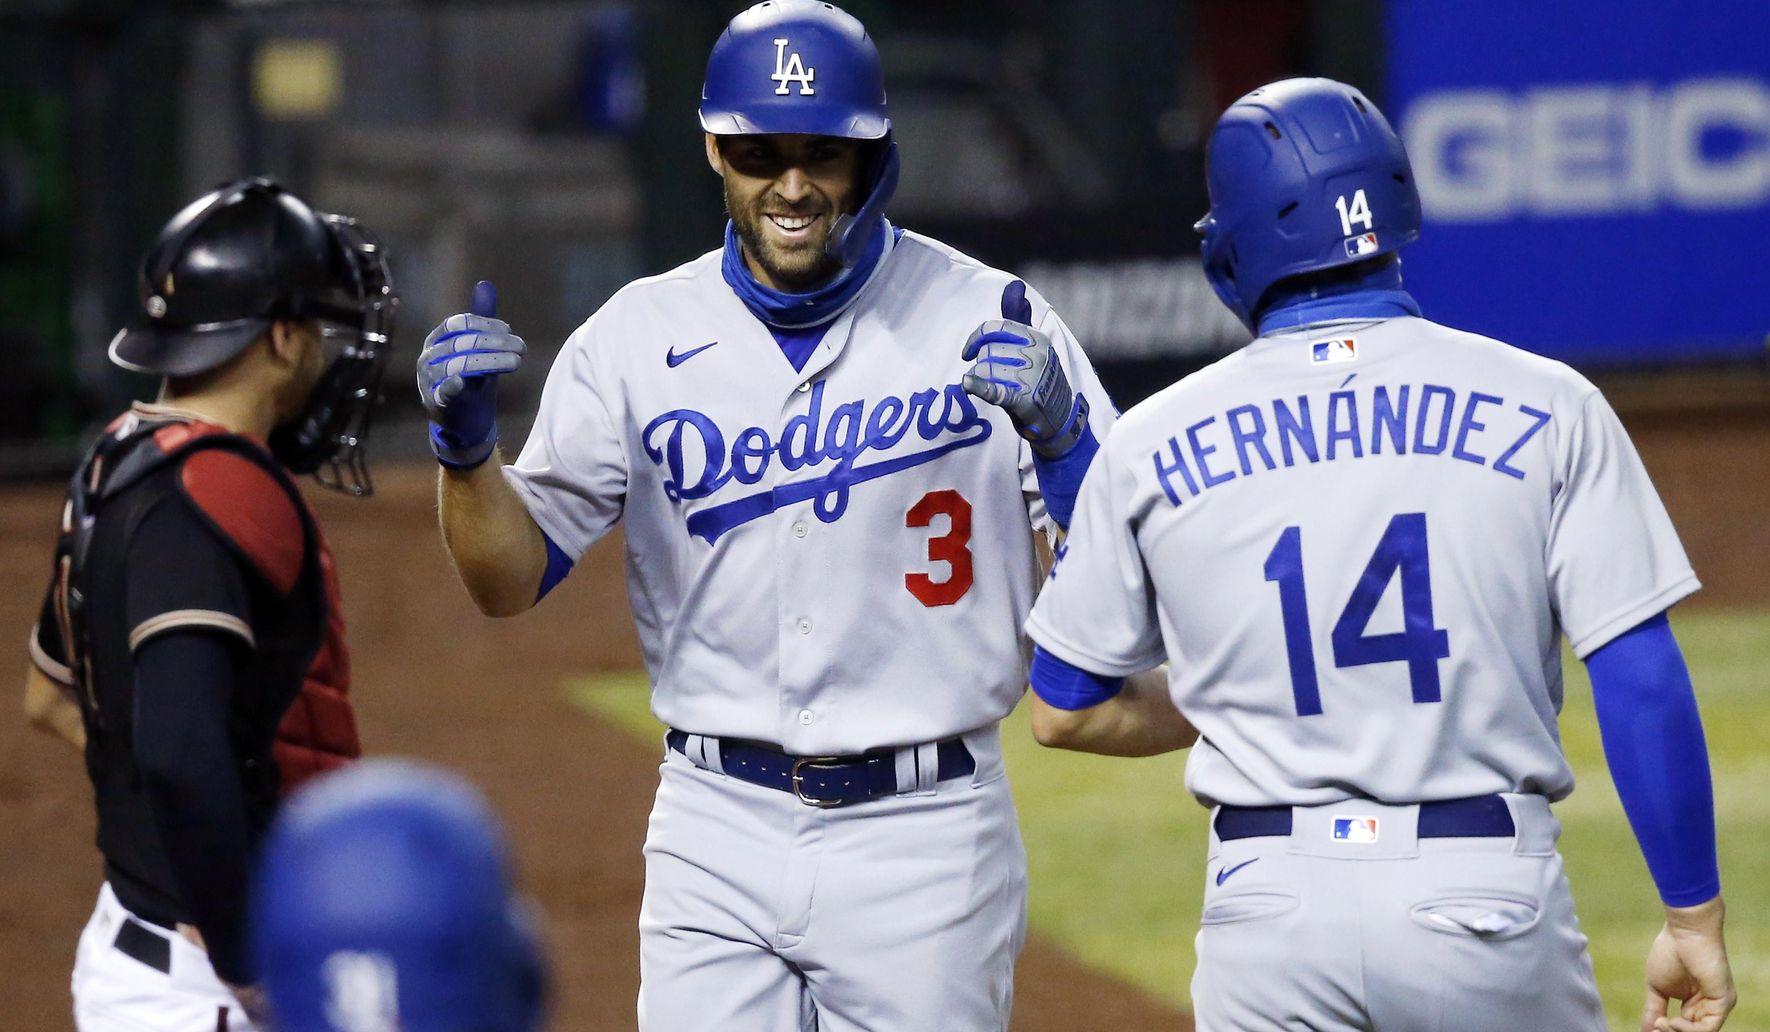 Dodgers_diamondbacks_baseball_84273_c0-151-3600-2249_s1770x1032